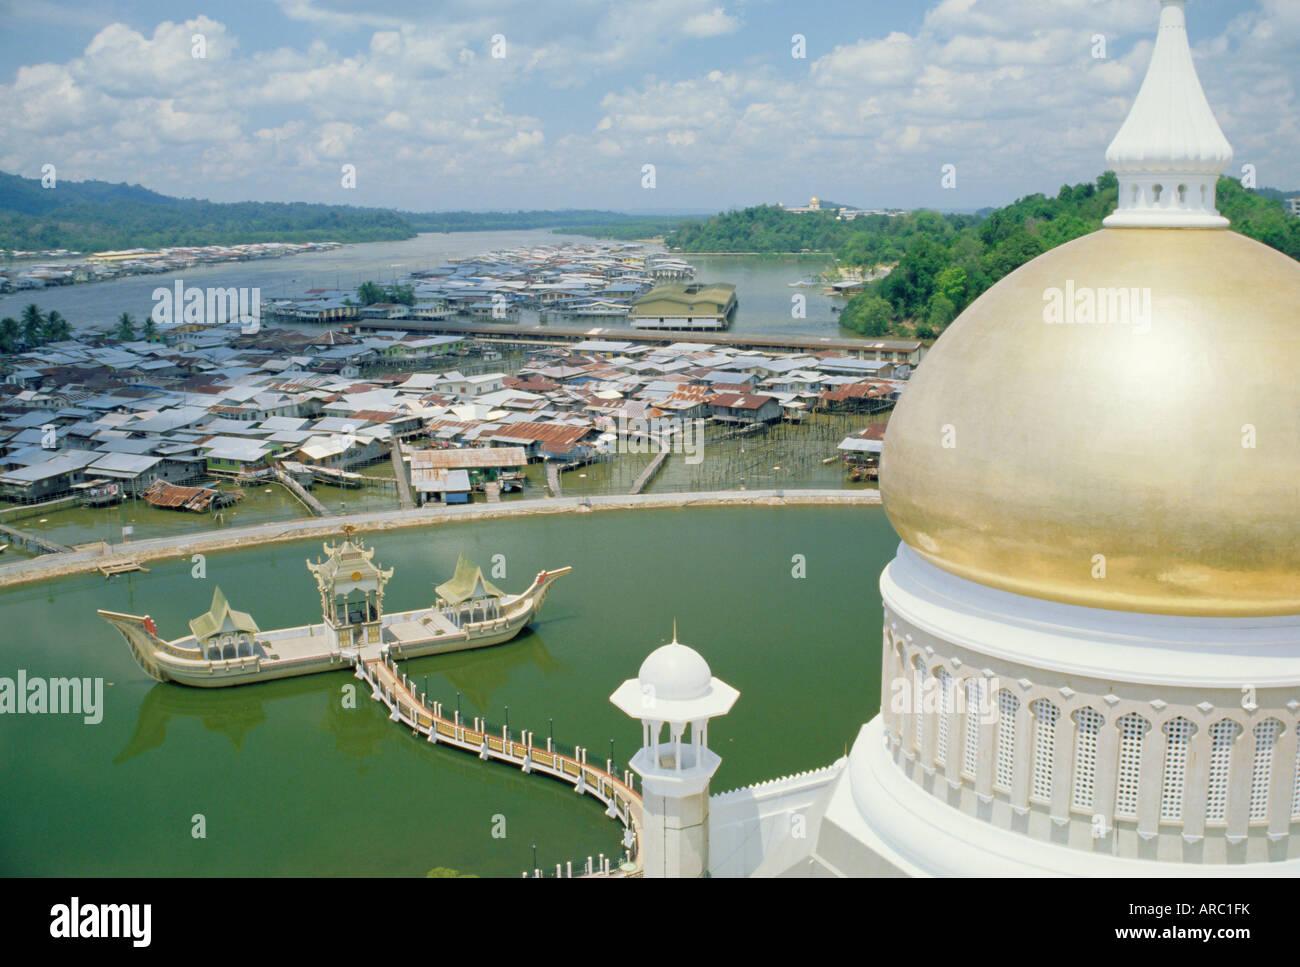 Omar Ali Saifuddin Mosque, Bandar Seri Begawan, Sultanate of Brunei, on the island of Borneo - Stock Image